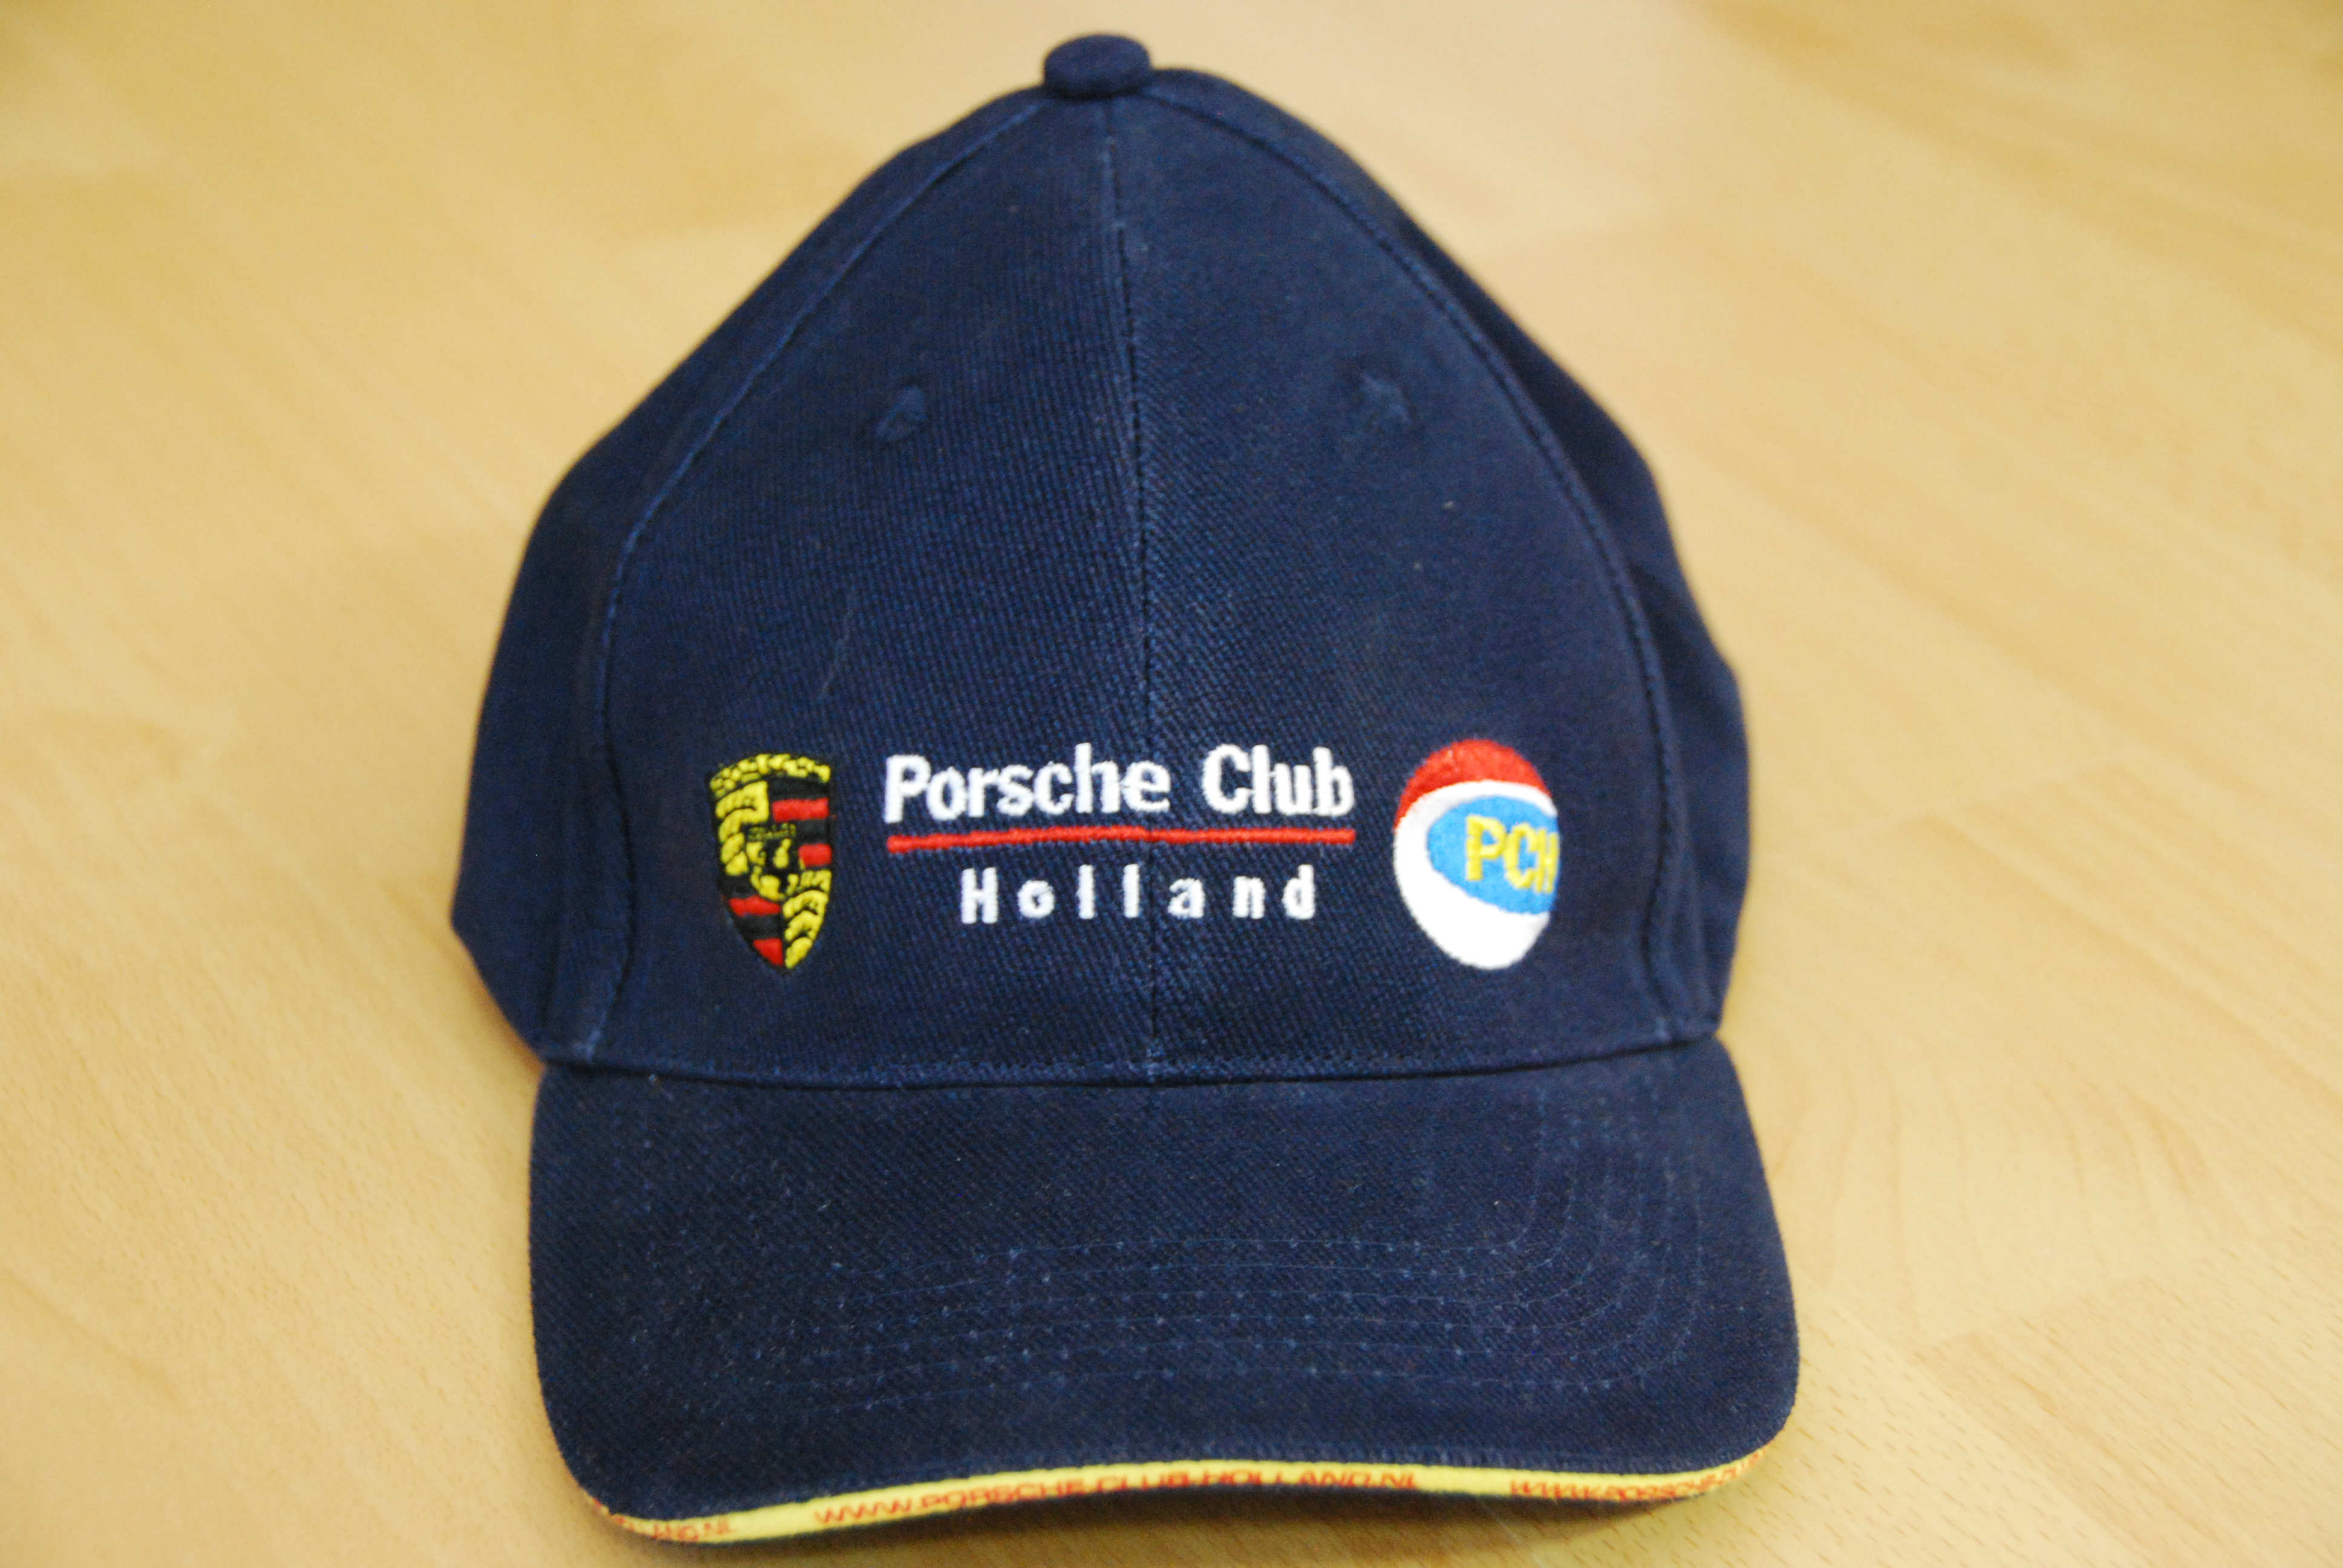 Shop Porsche Club Holland